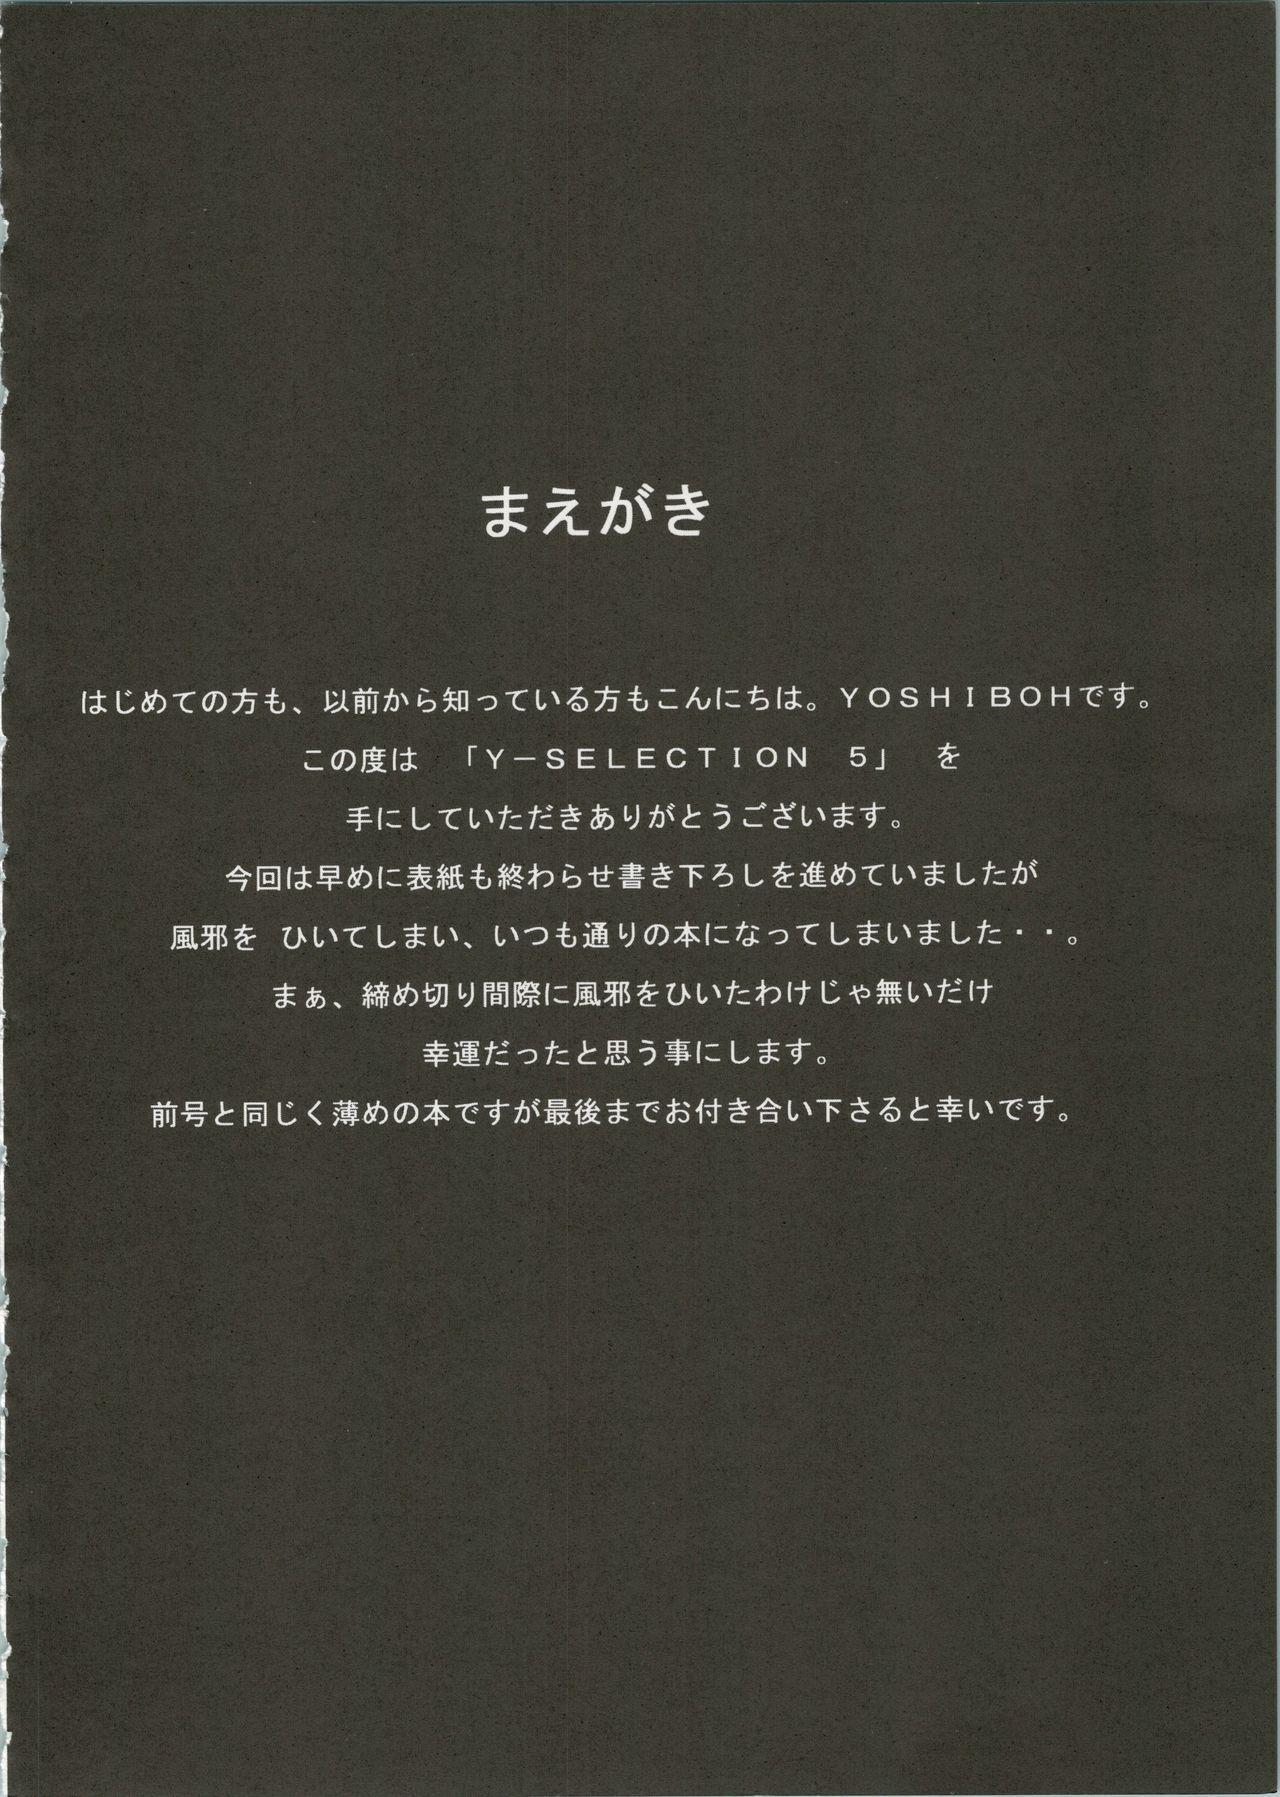 Y-SELECTION 5 3